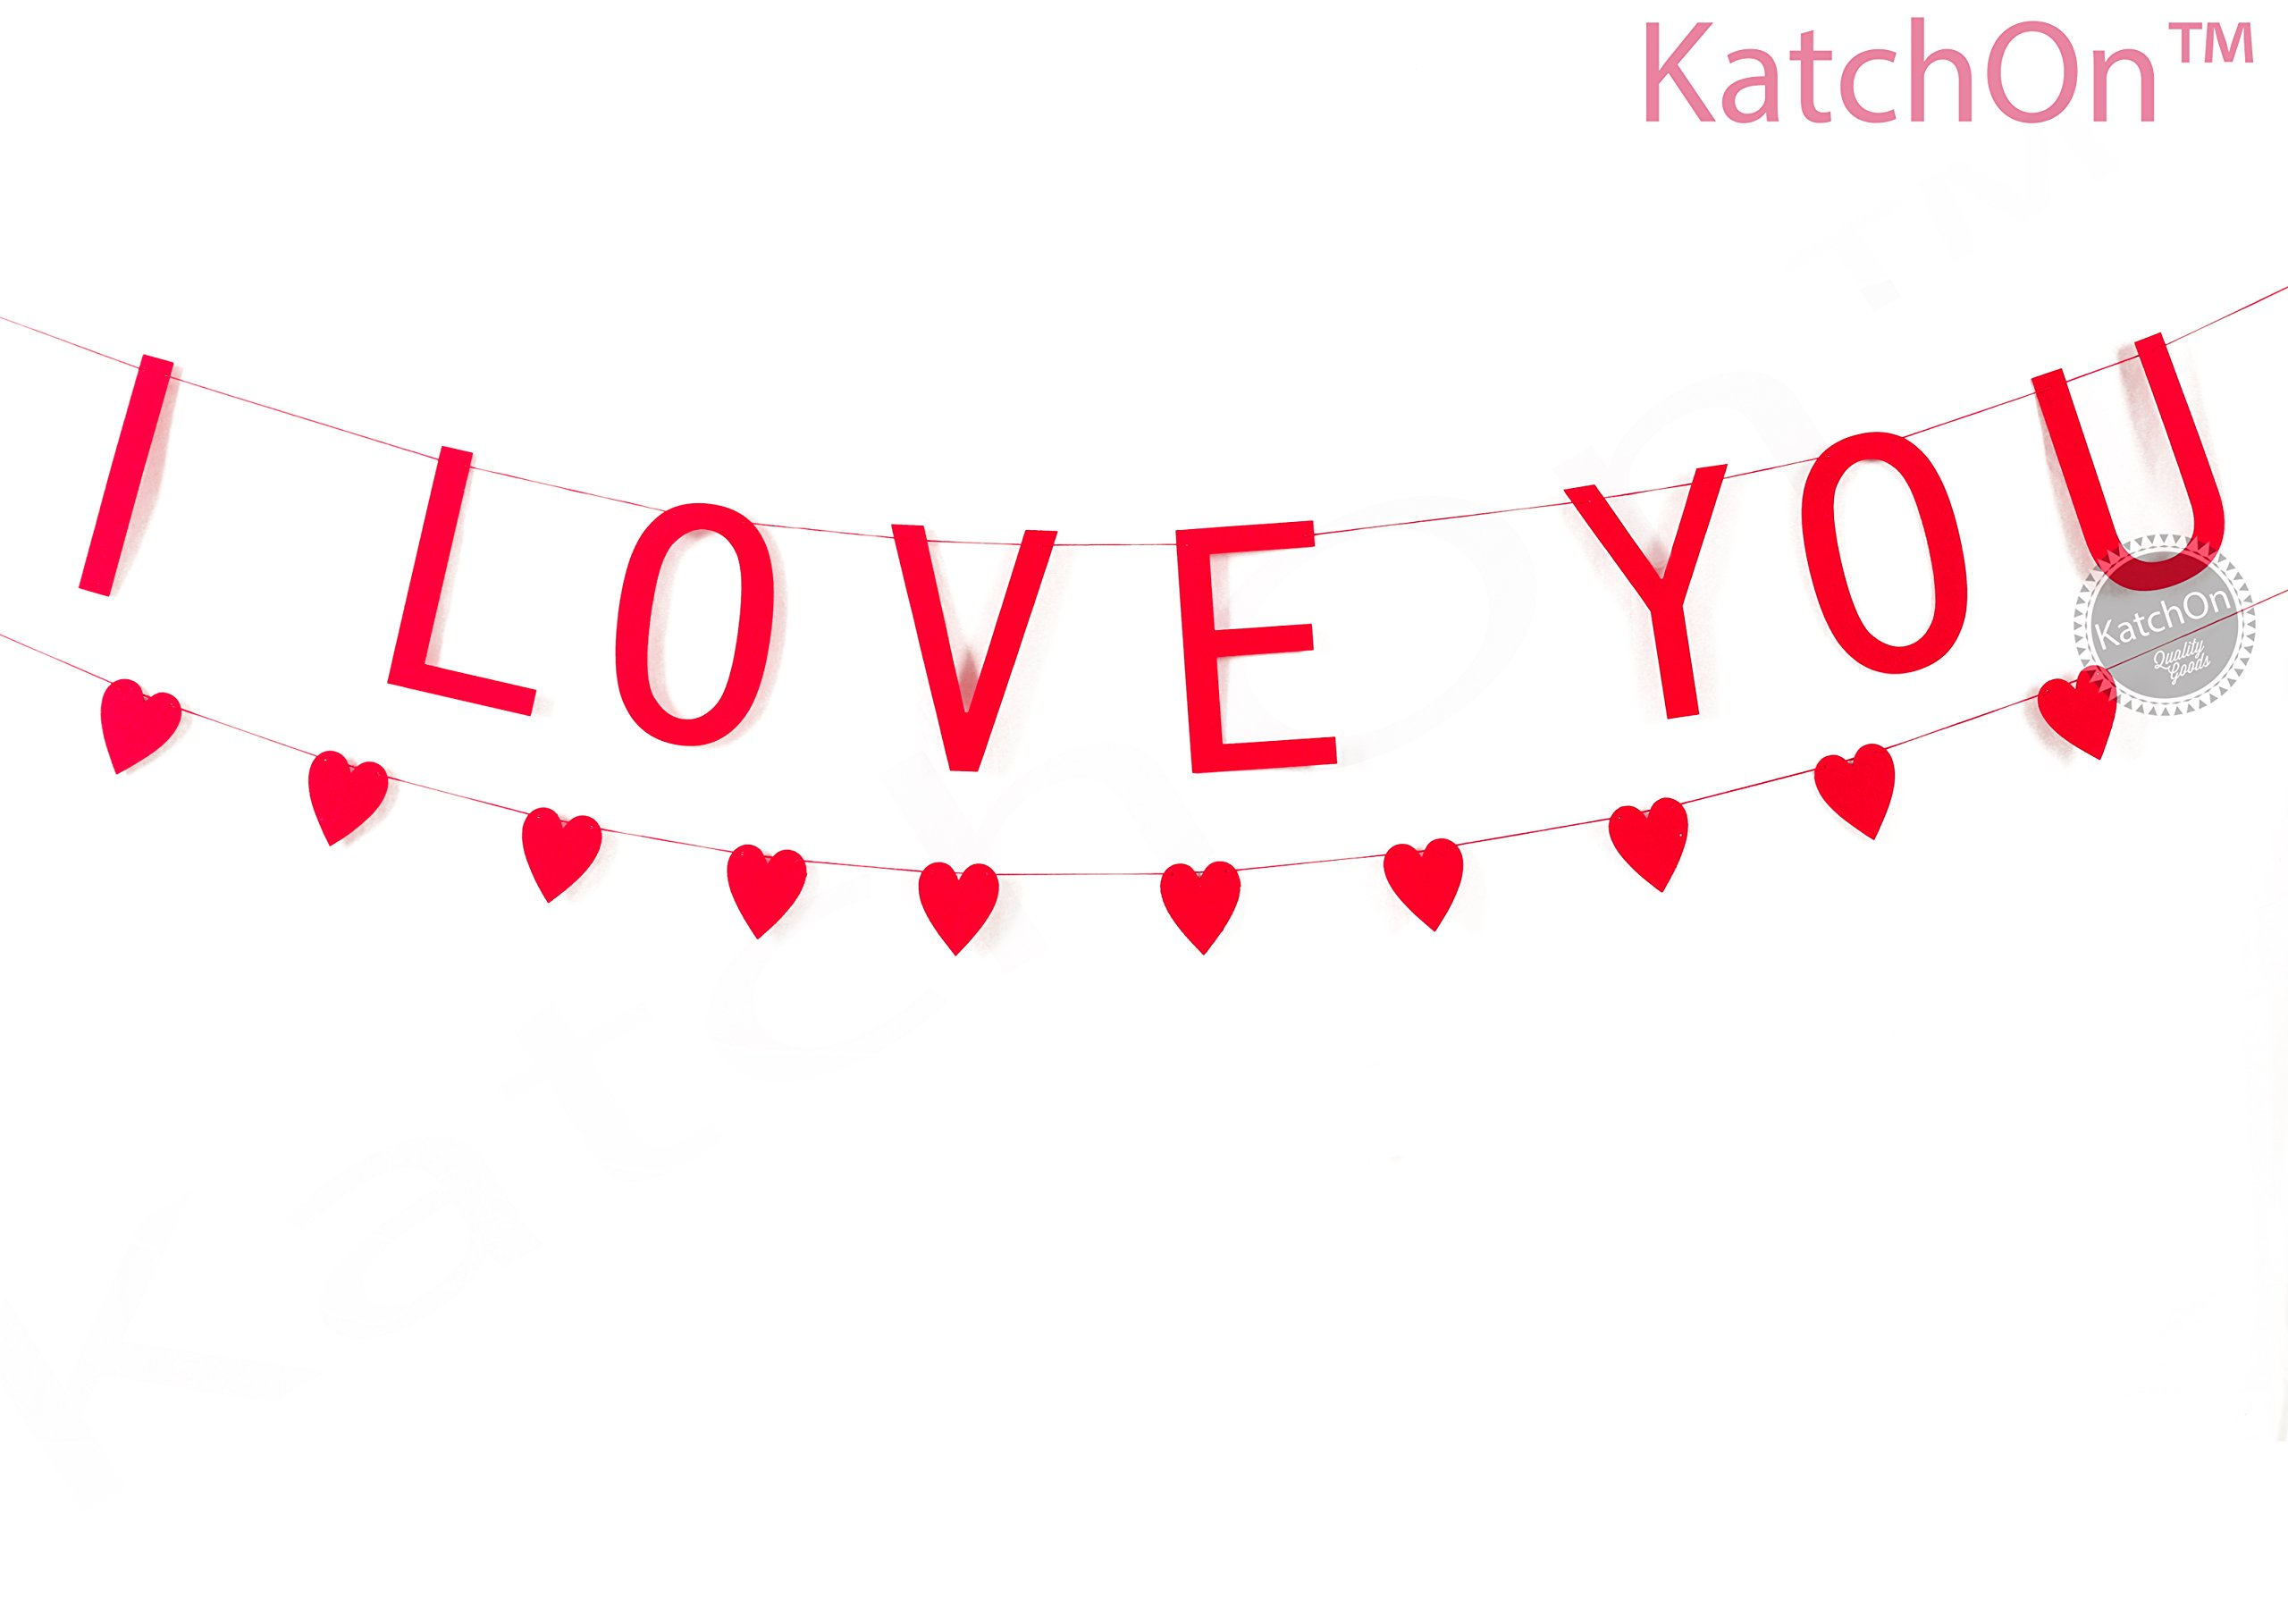 i love you banner valentine day banner decoration mother day wedding